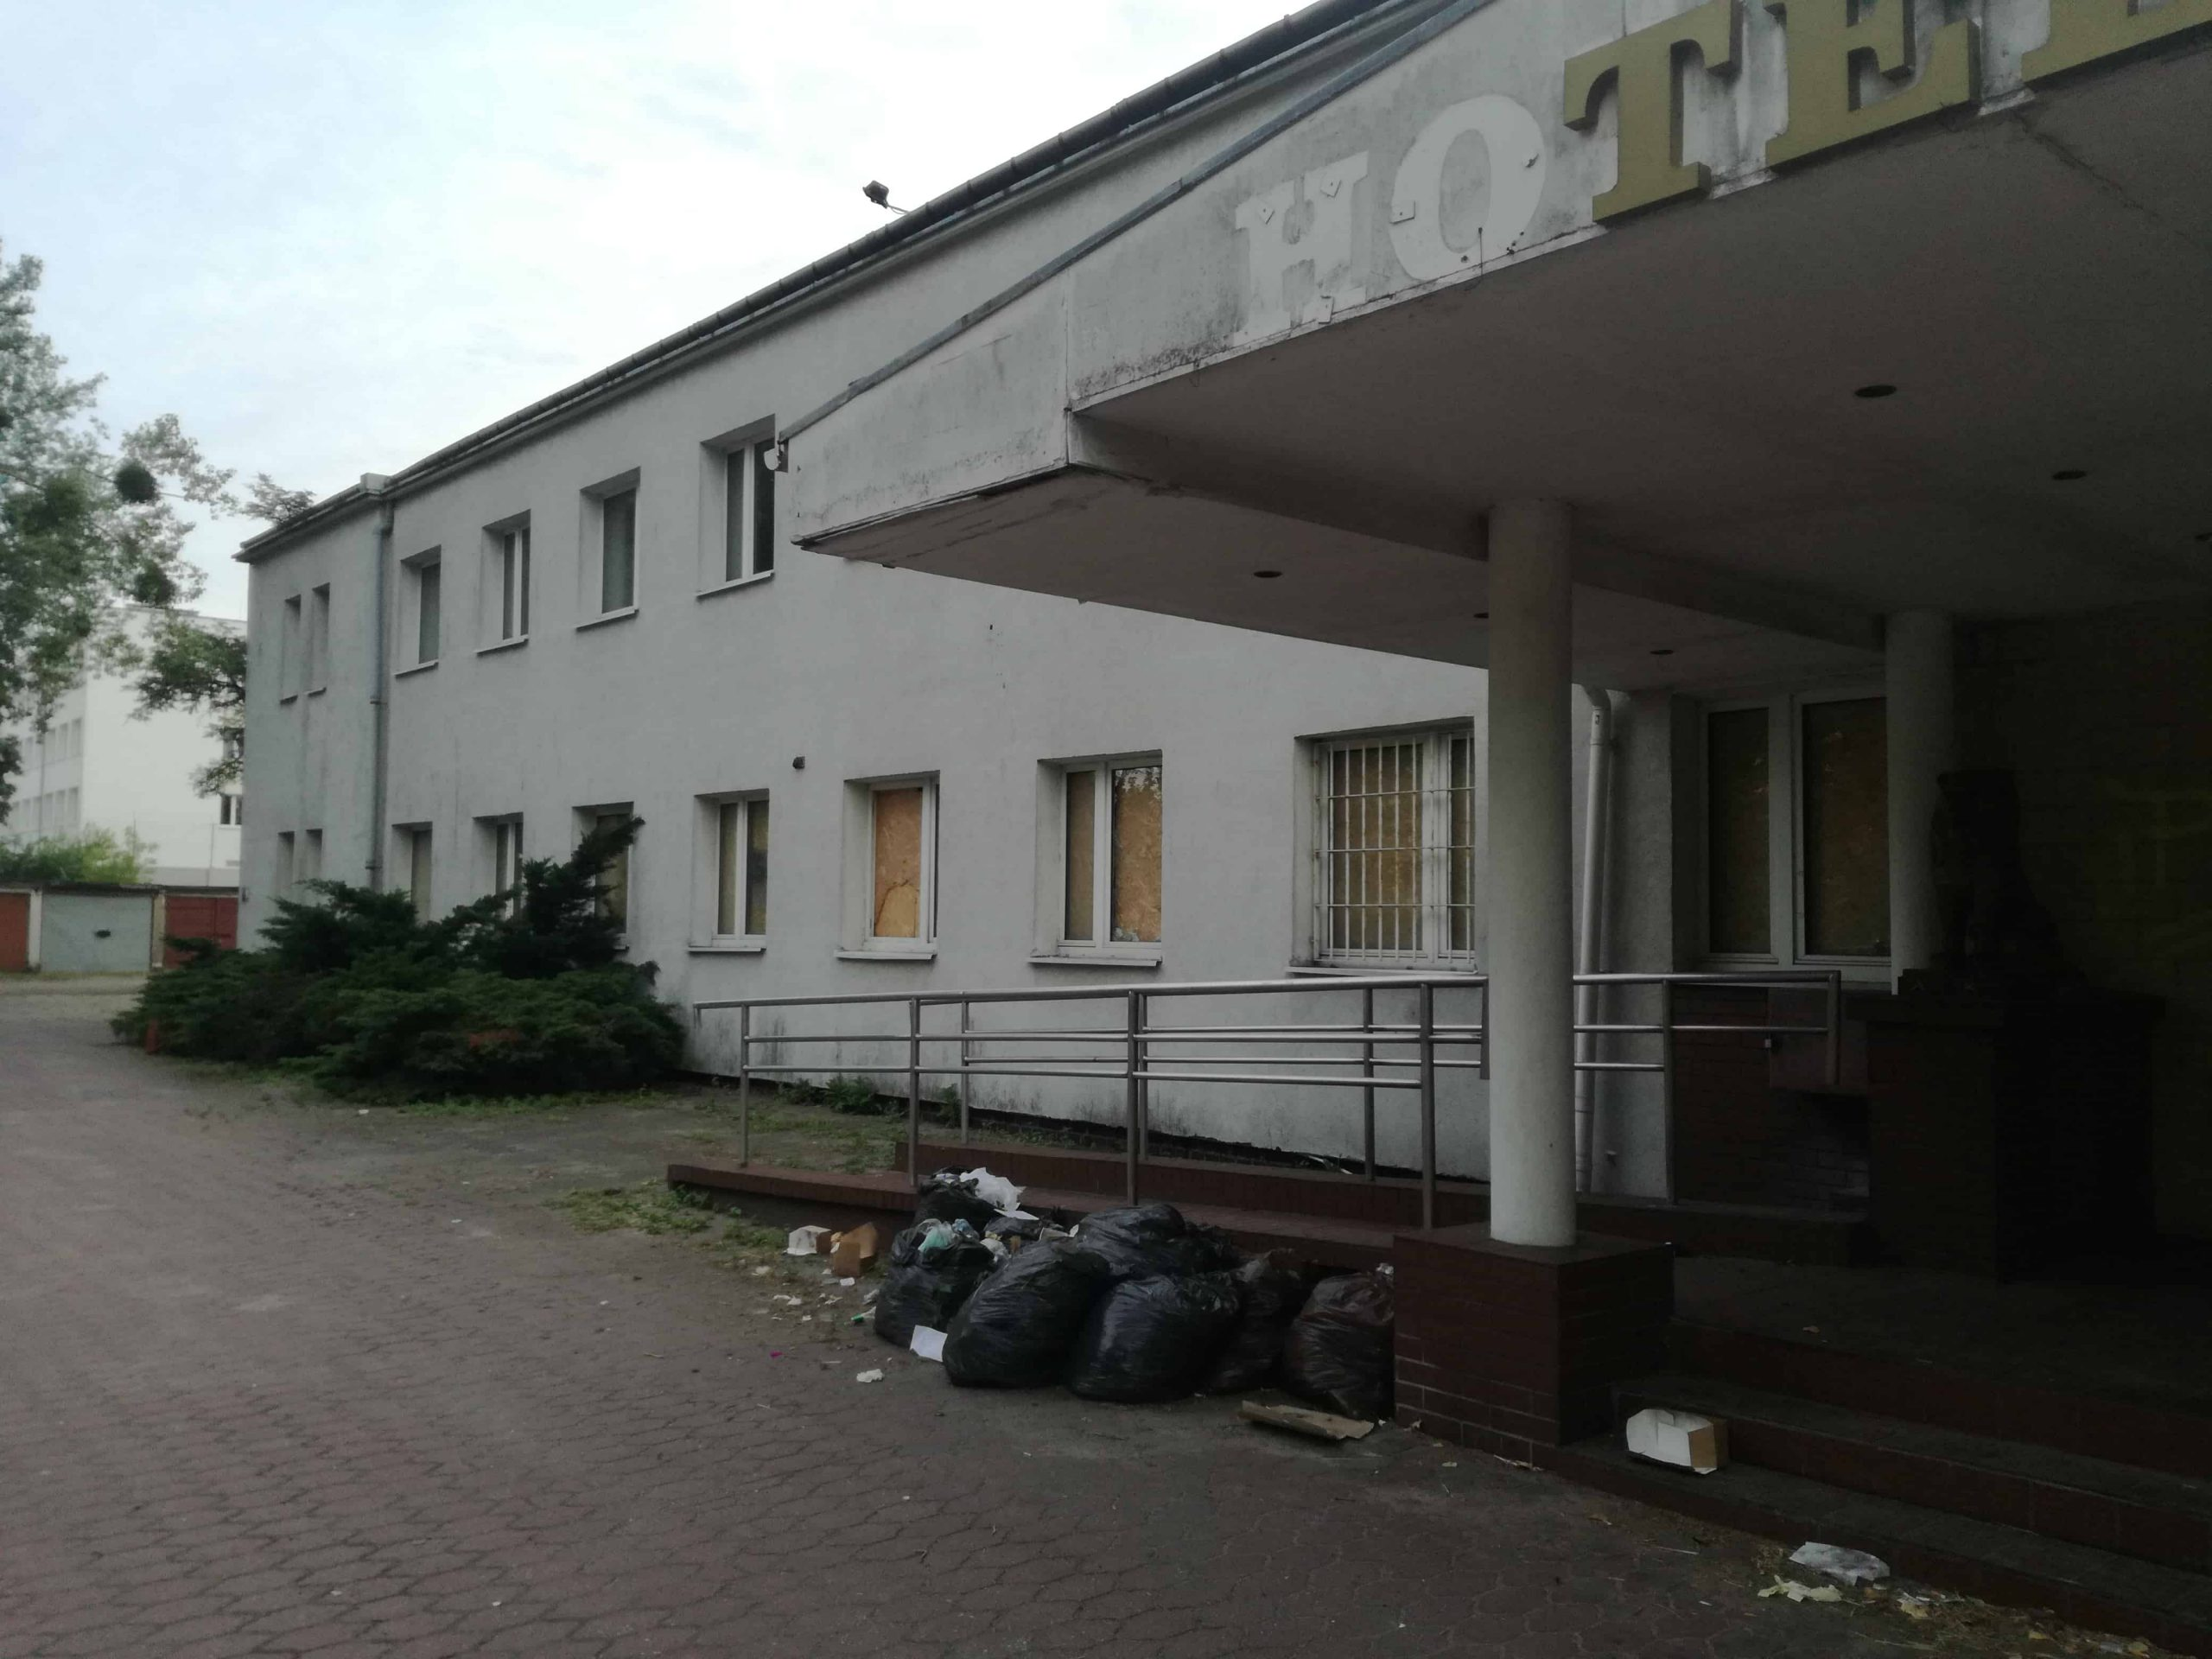 Budynek od frontu - Hotel Apollo - lewa strona.